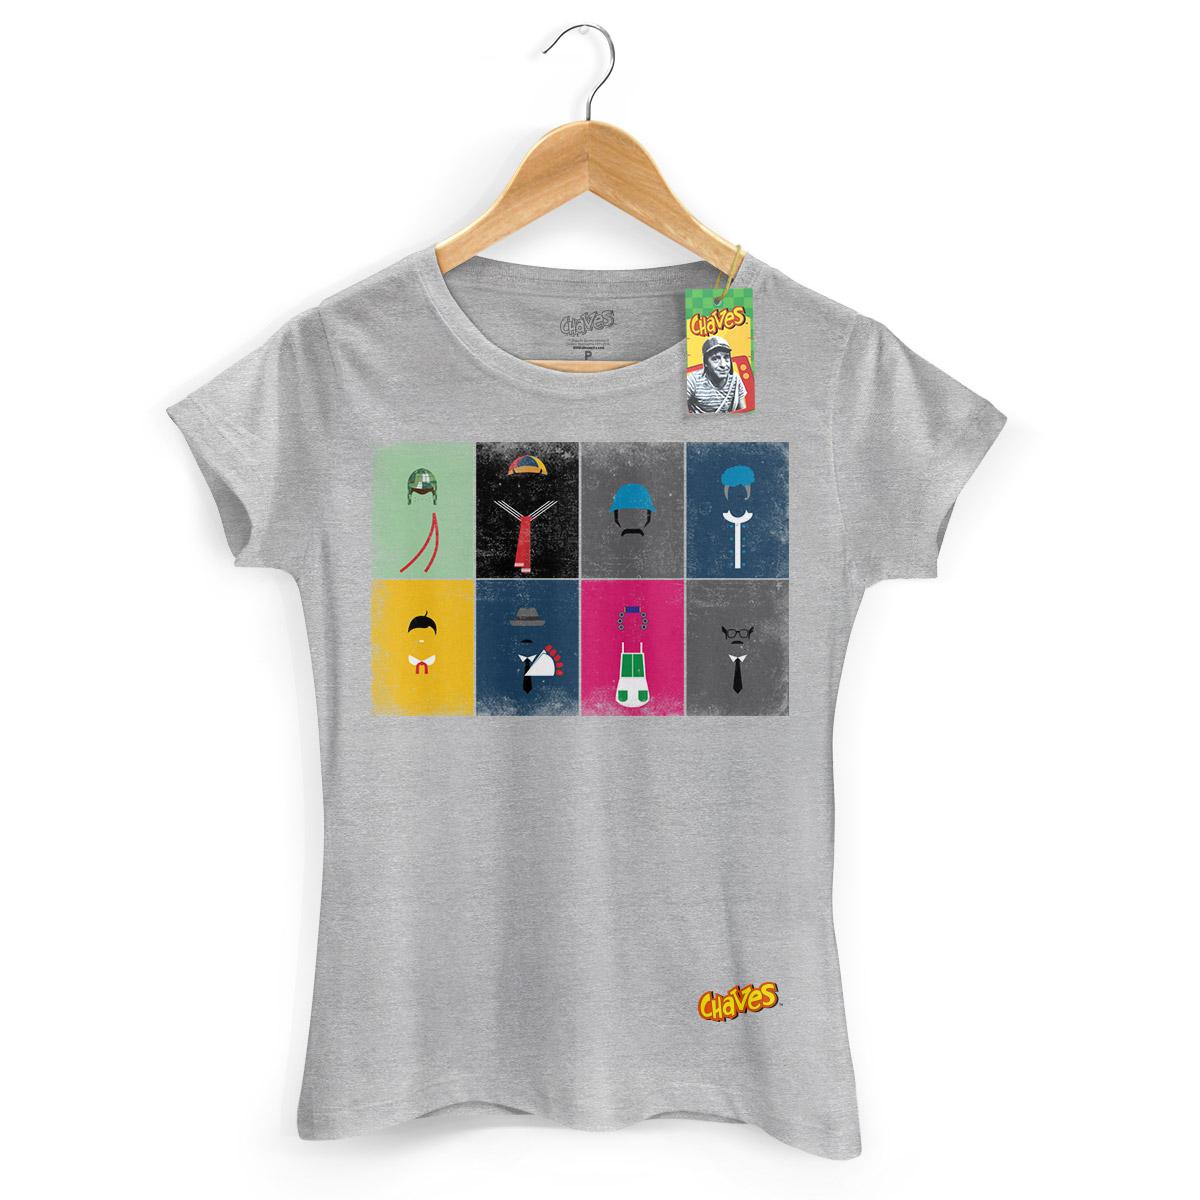 Camiseta Feminina Chaves Ícones Vintage